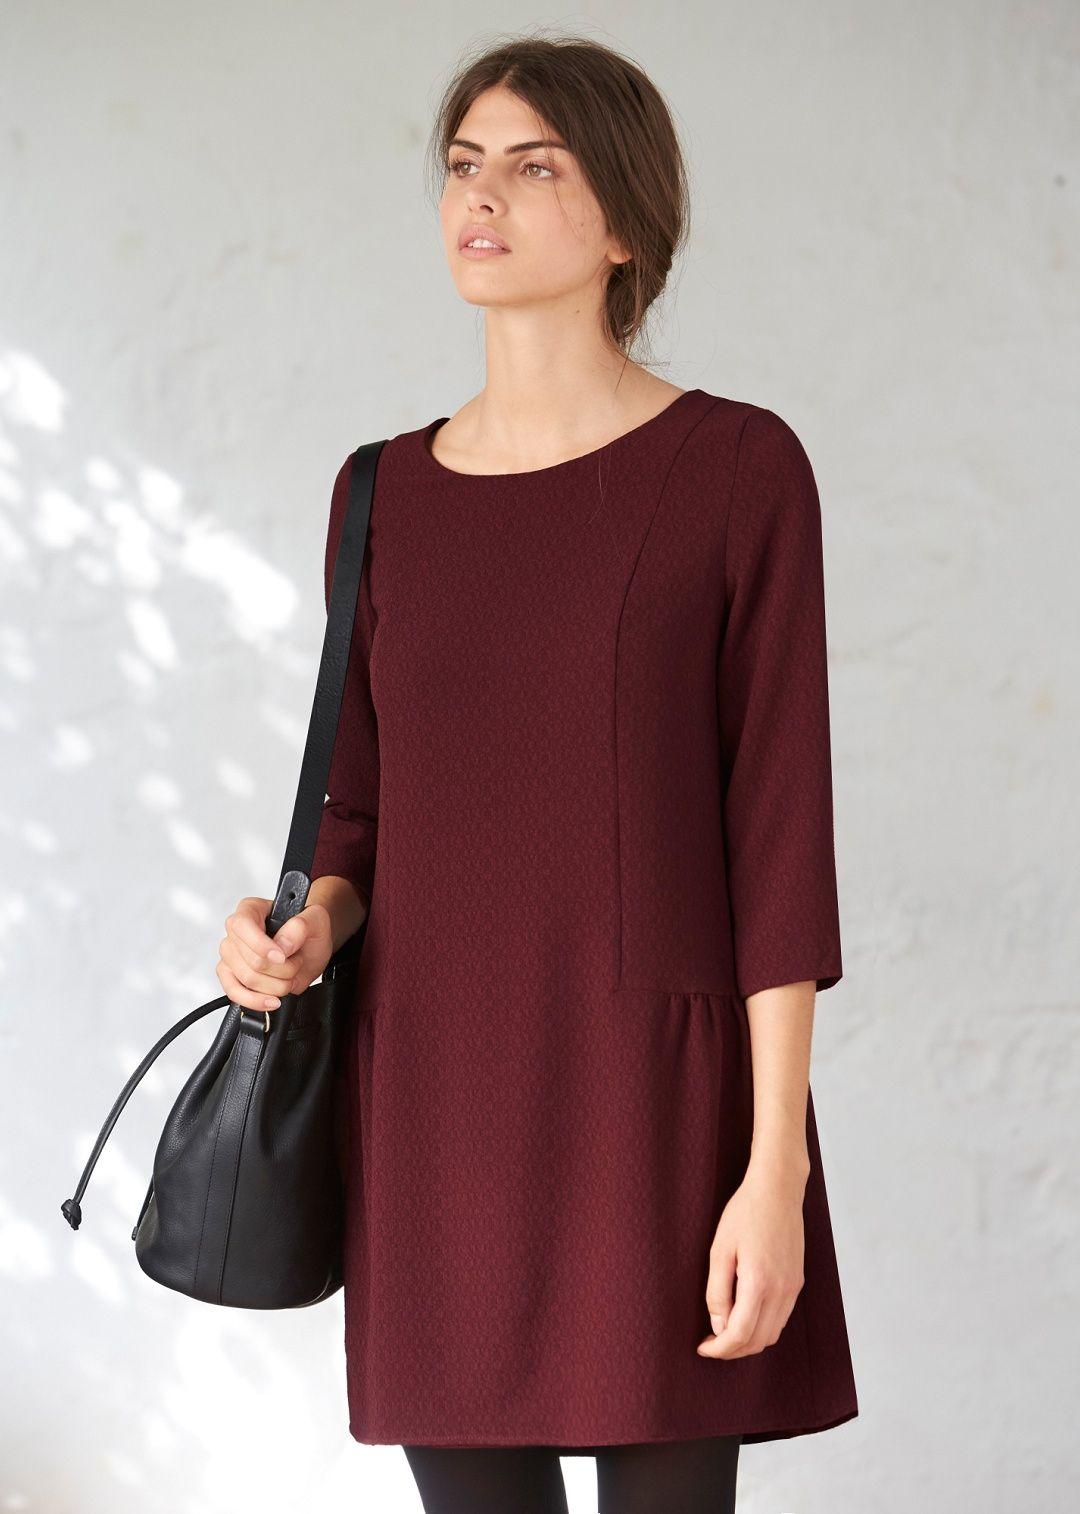 ca4340bca70 Sézane - Jason Dress Long Skirts